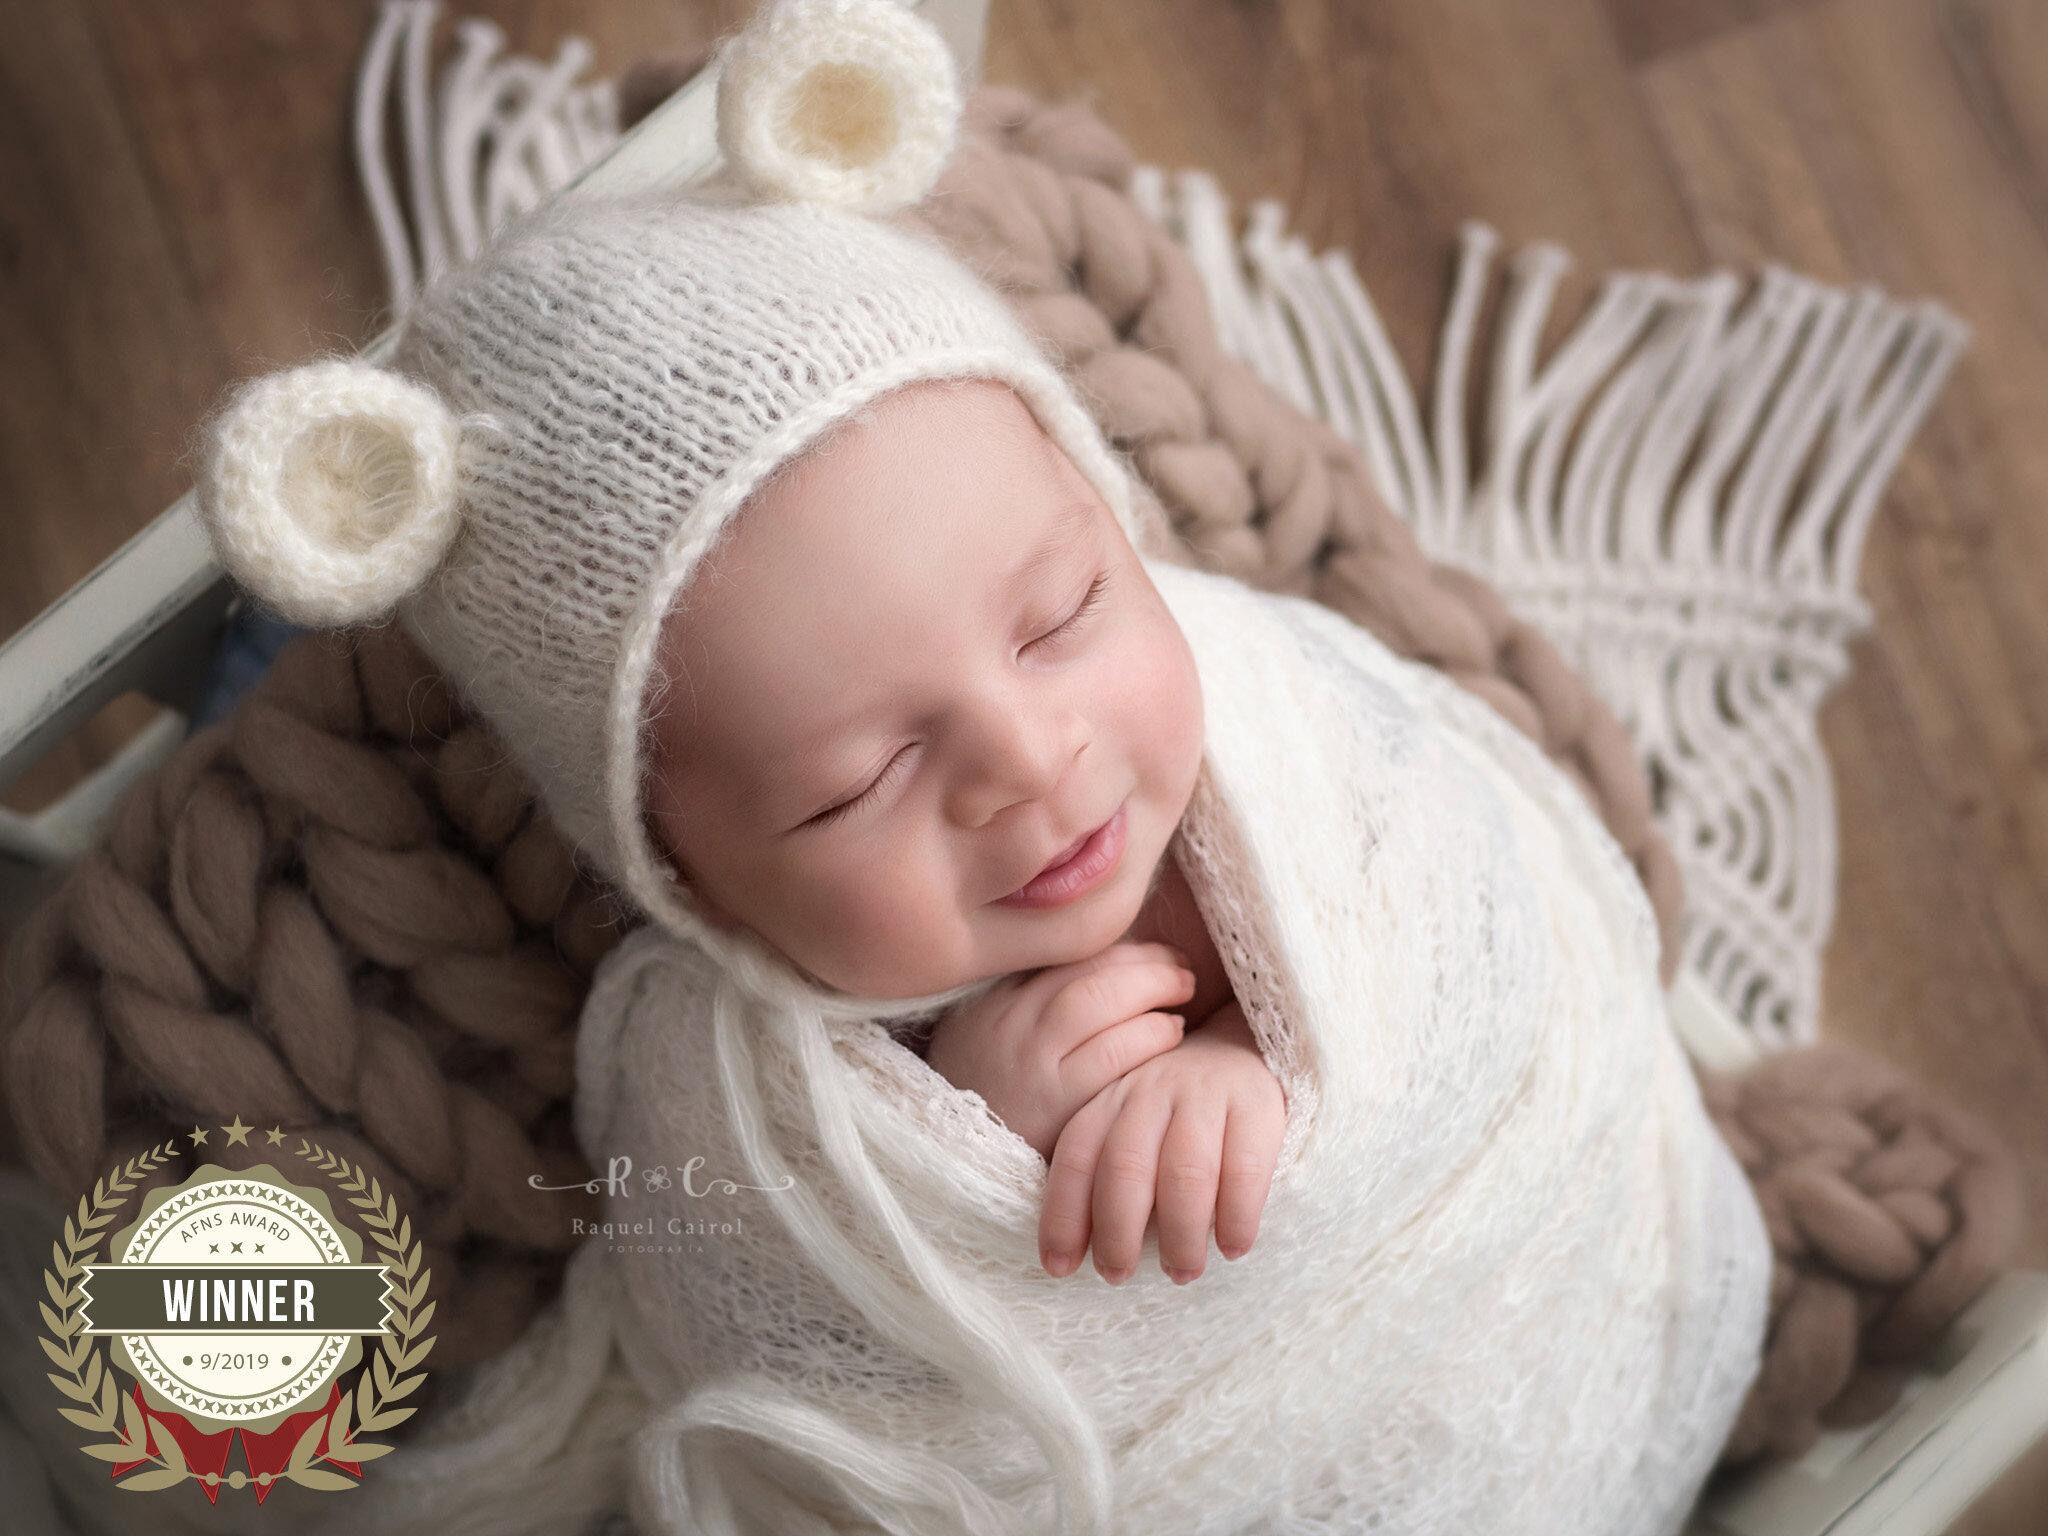 56906442_raquel_cairol_-_ian_newborn_3_copia.jpg